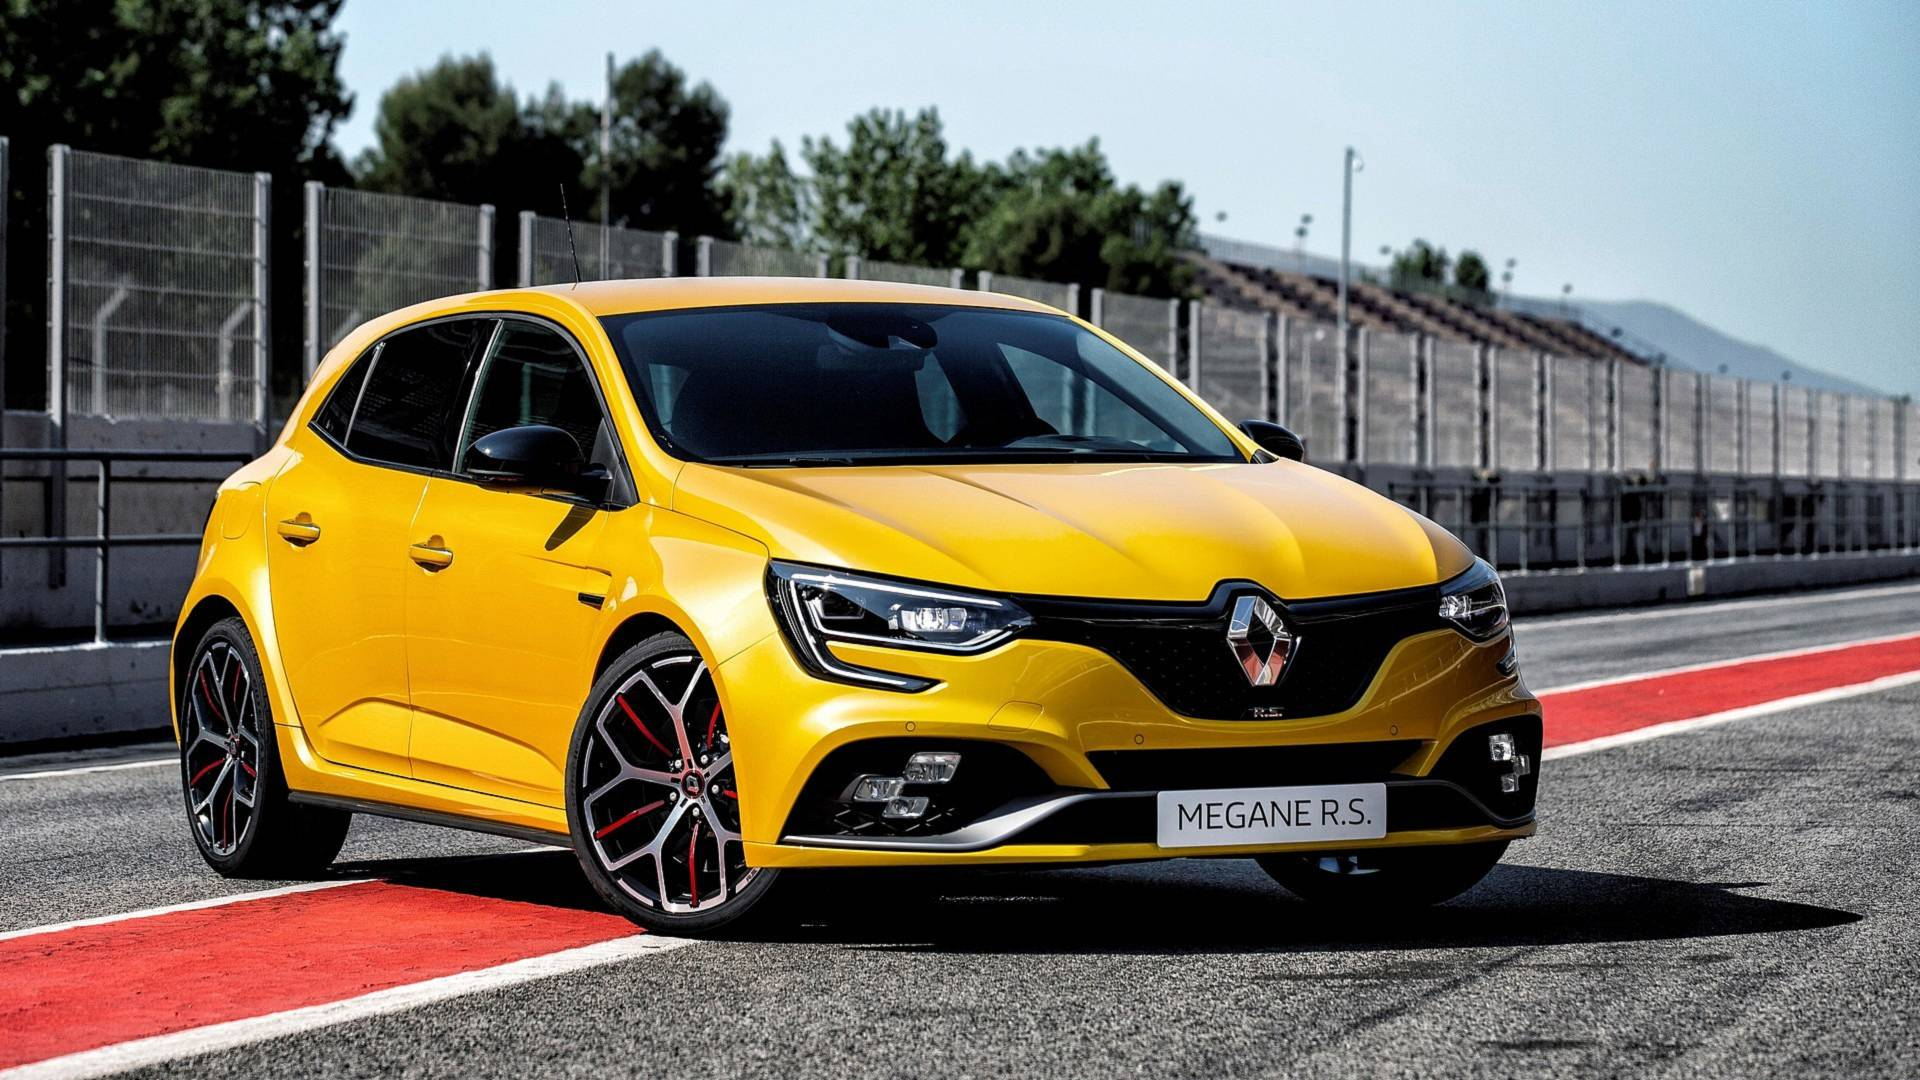 Renault Mégane R. S.